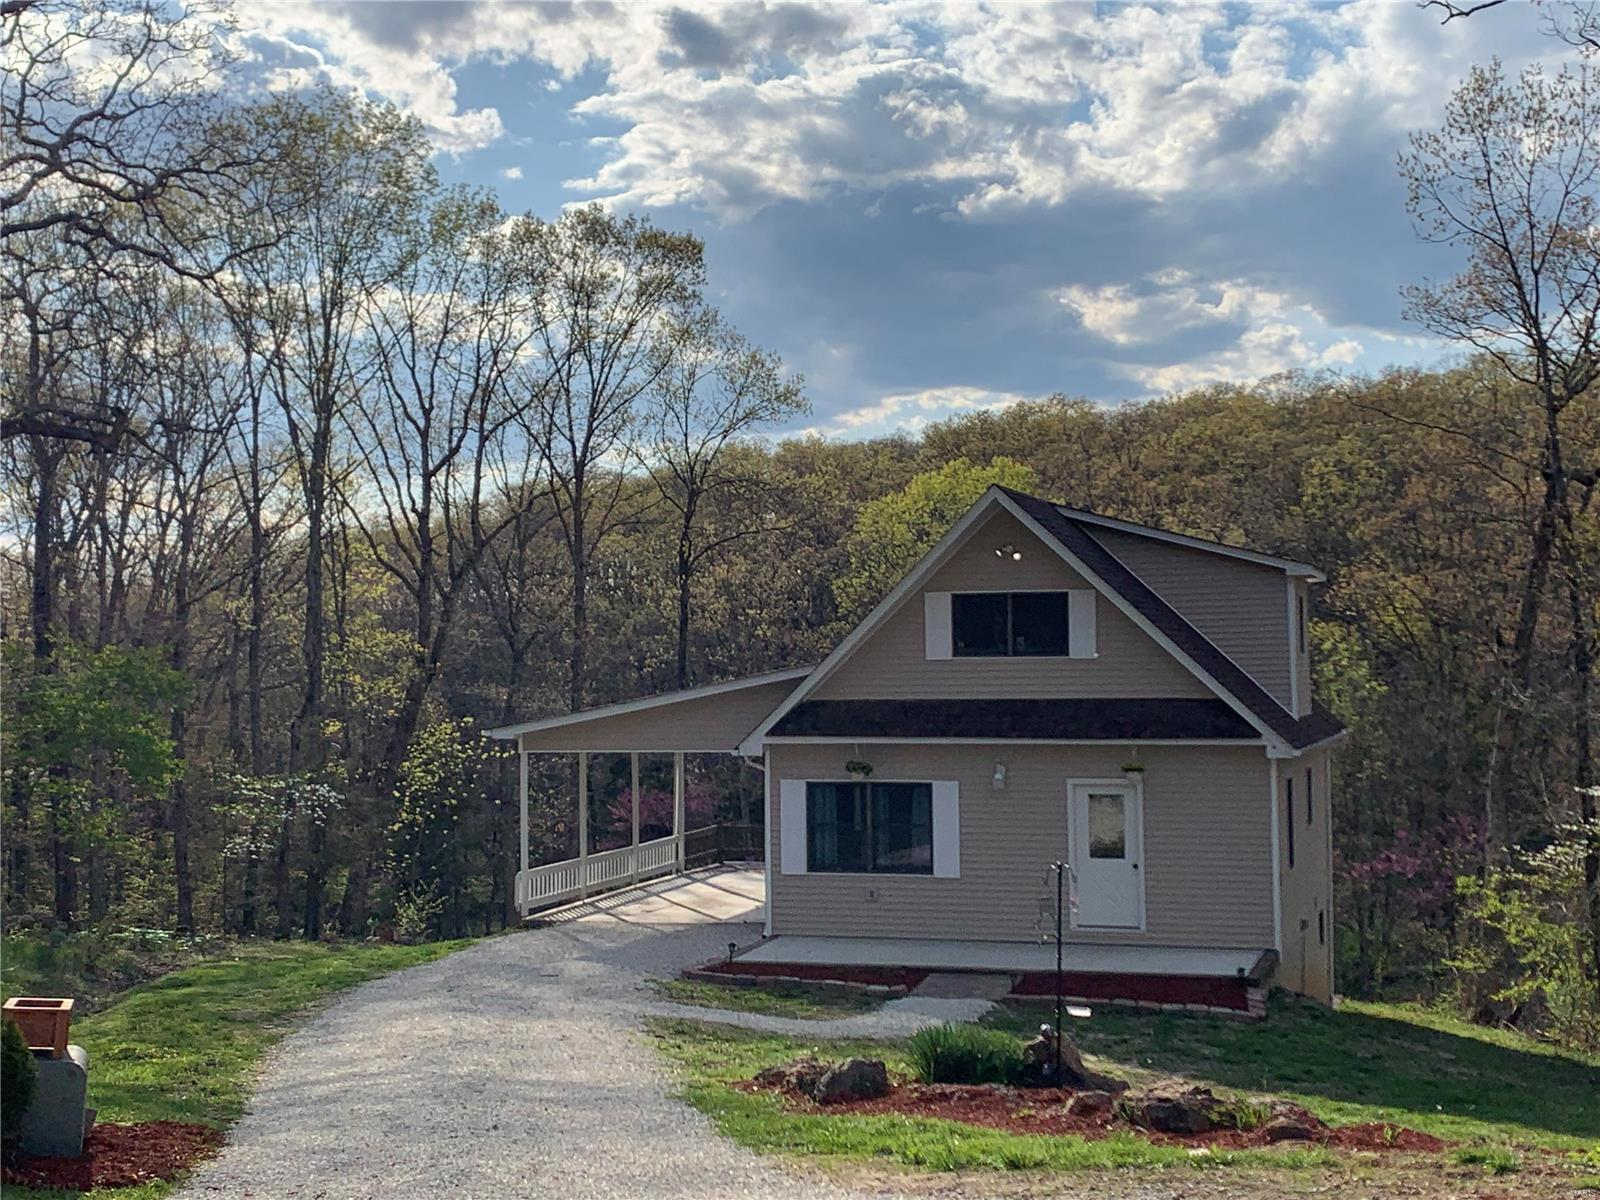 1205 E STUDE Lane Property Photo - Bland, MO real estate listing